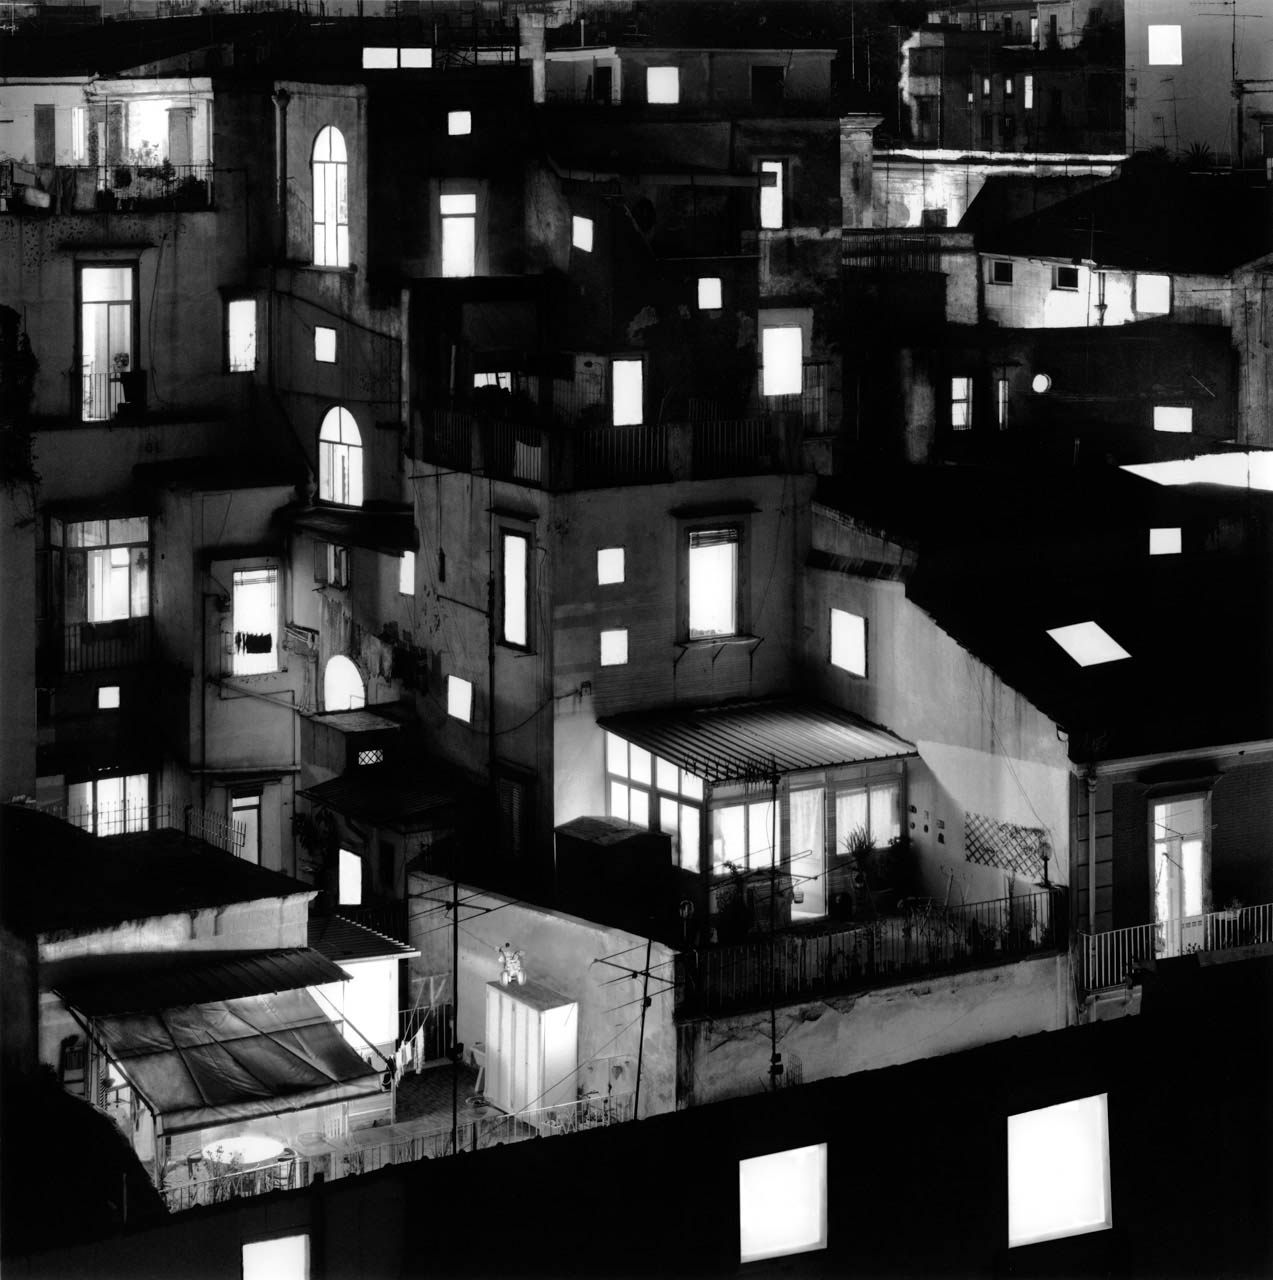 Tetti di case, Quartieri Spagnoli, 2001 Stampa digitale su carta Hahnemuhle, cm 100x100 / 120x120 / 140x140 (ed. 6 + 1AP)